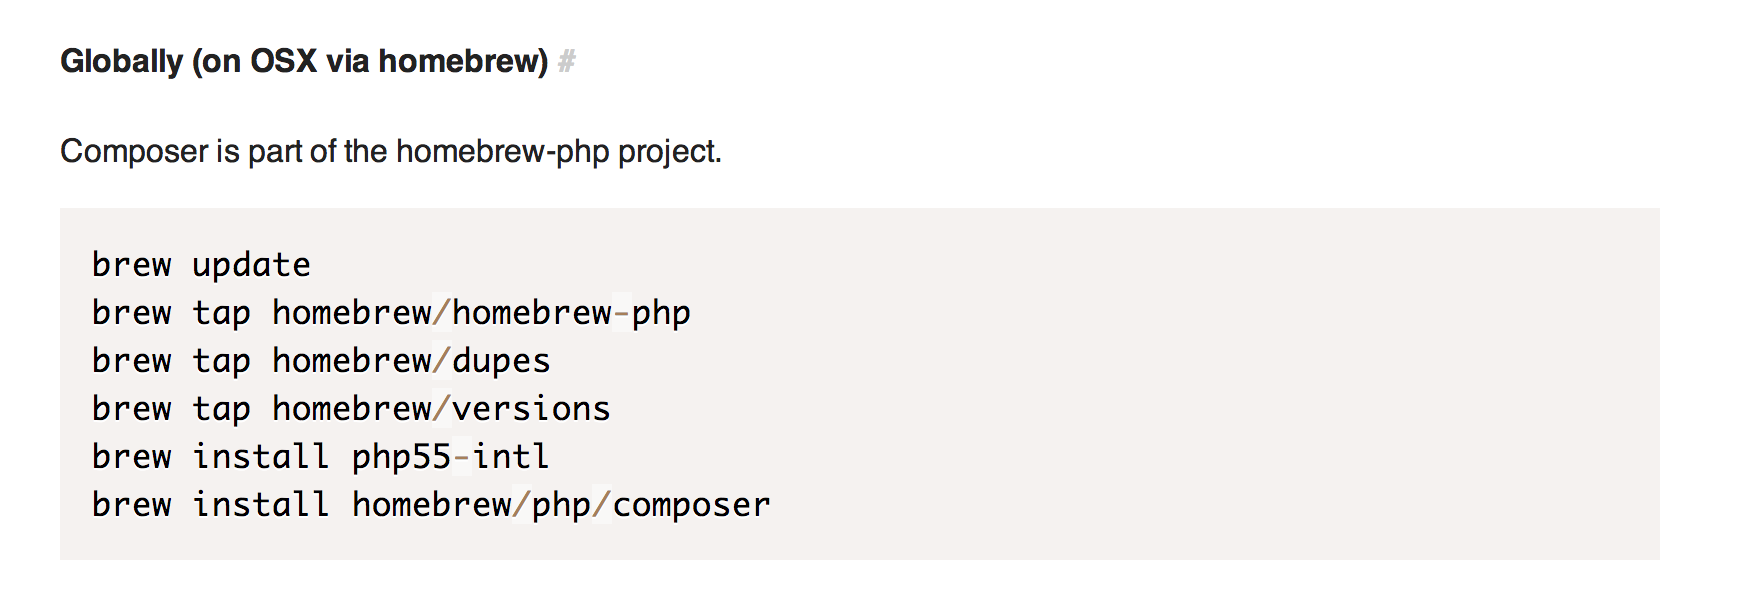 mac brew install php intl